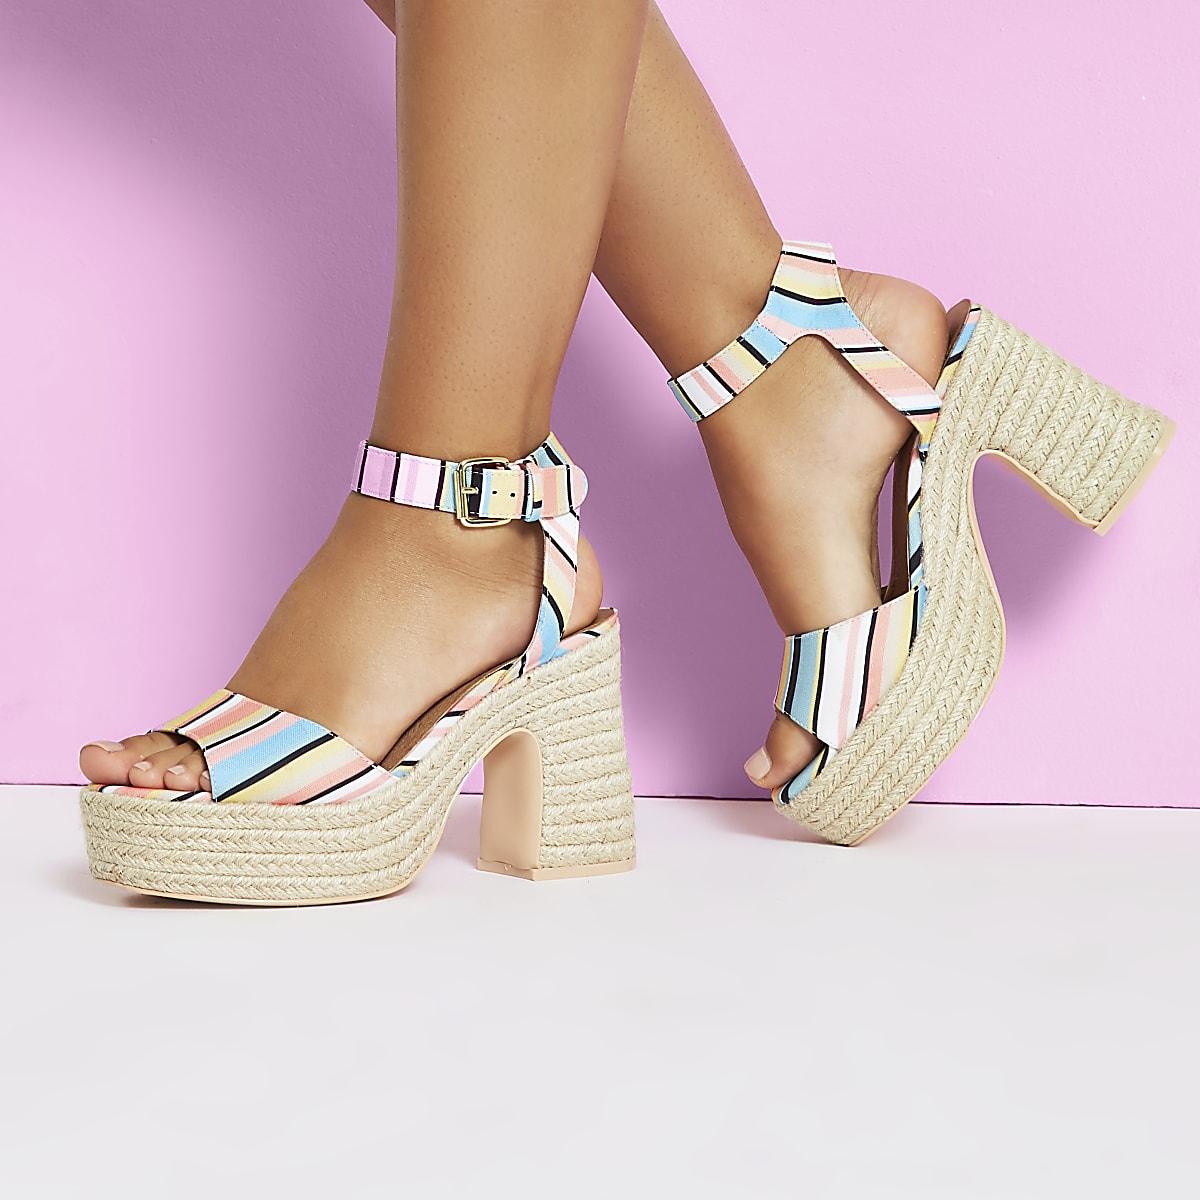 06d9d610b34 White stripe Caroline Flack block heel sandal - Sandals - Shoes   Boots -  women